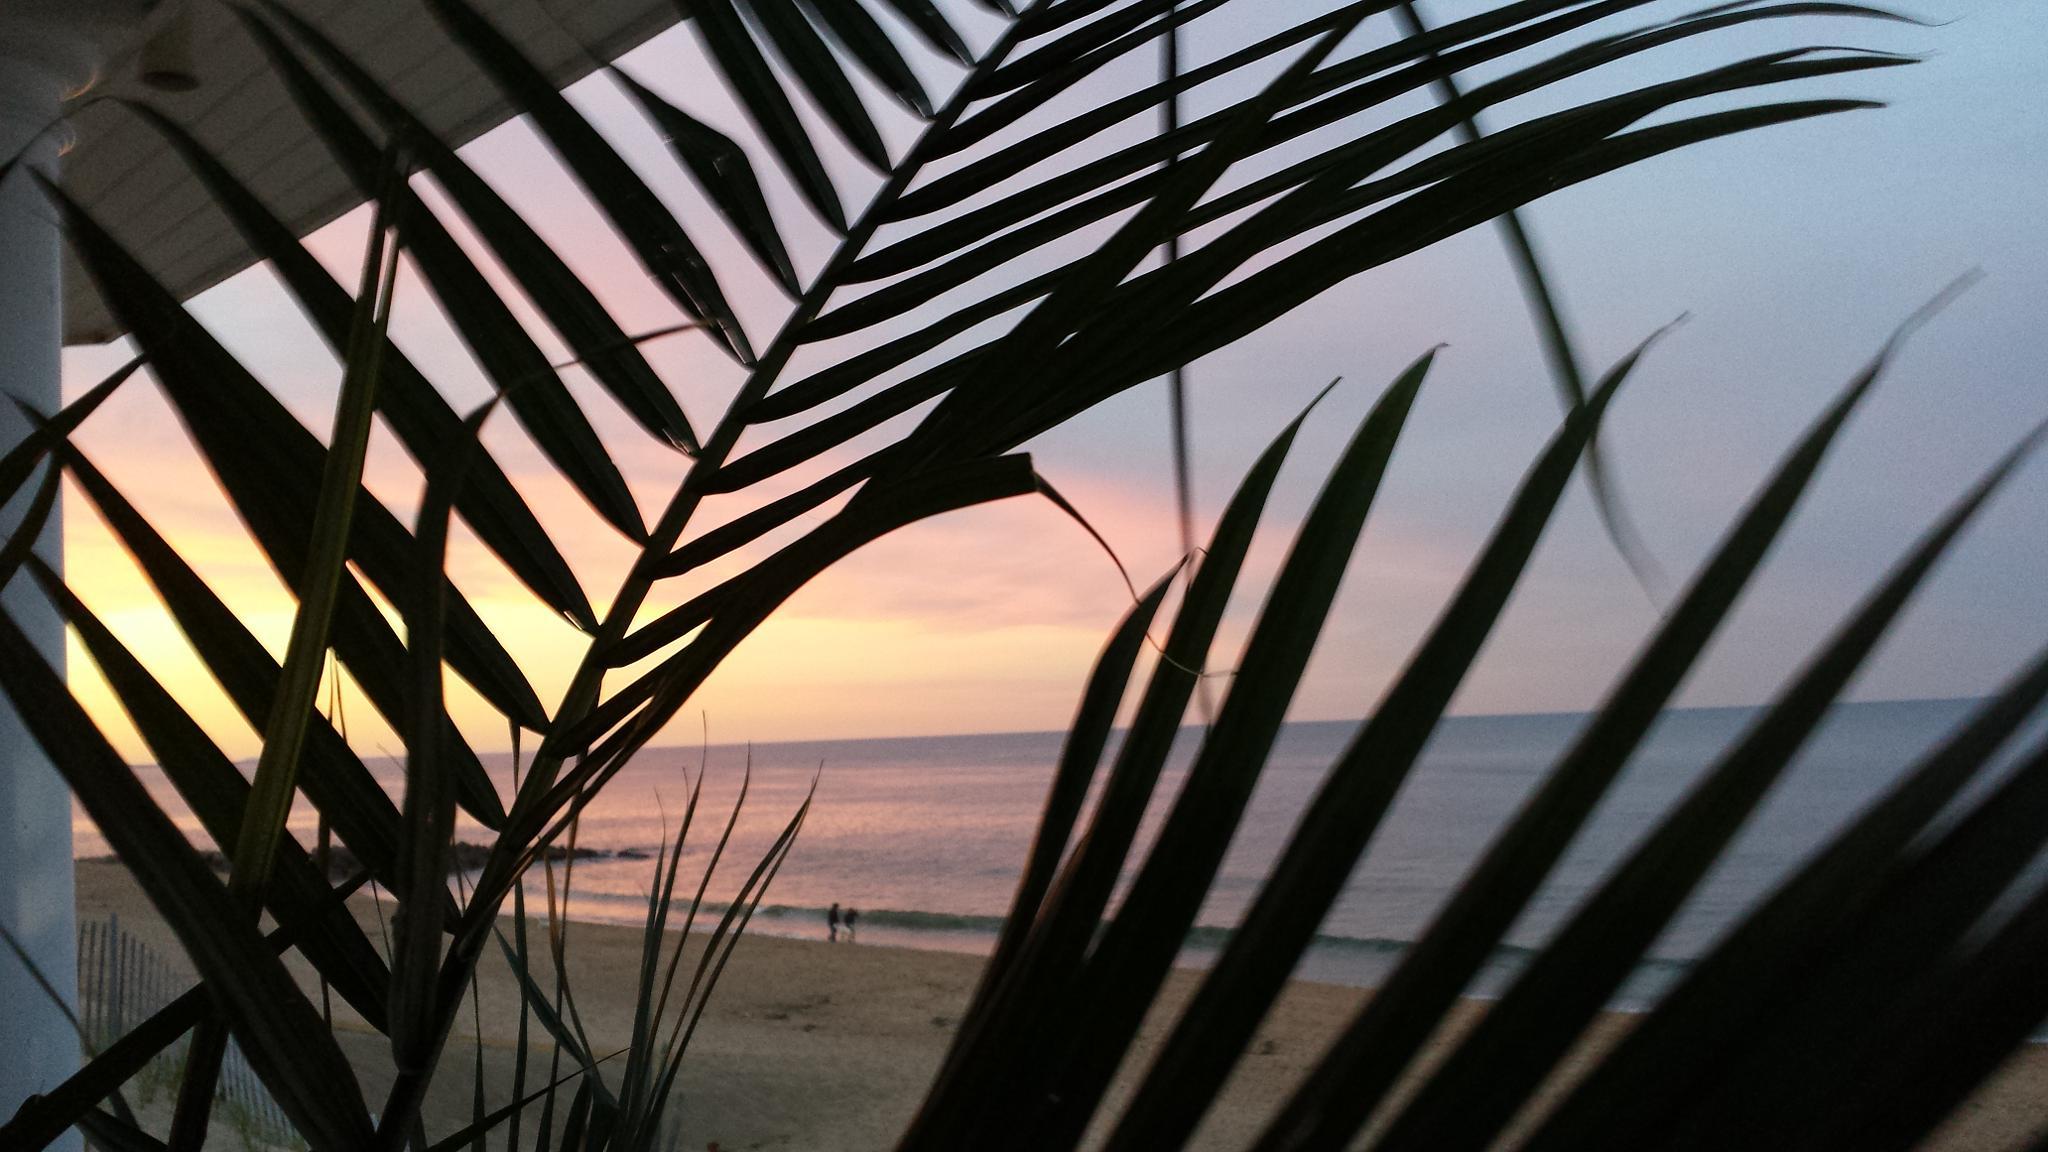 Porch view of Plum Island beachgoers by wa6dia359